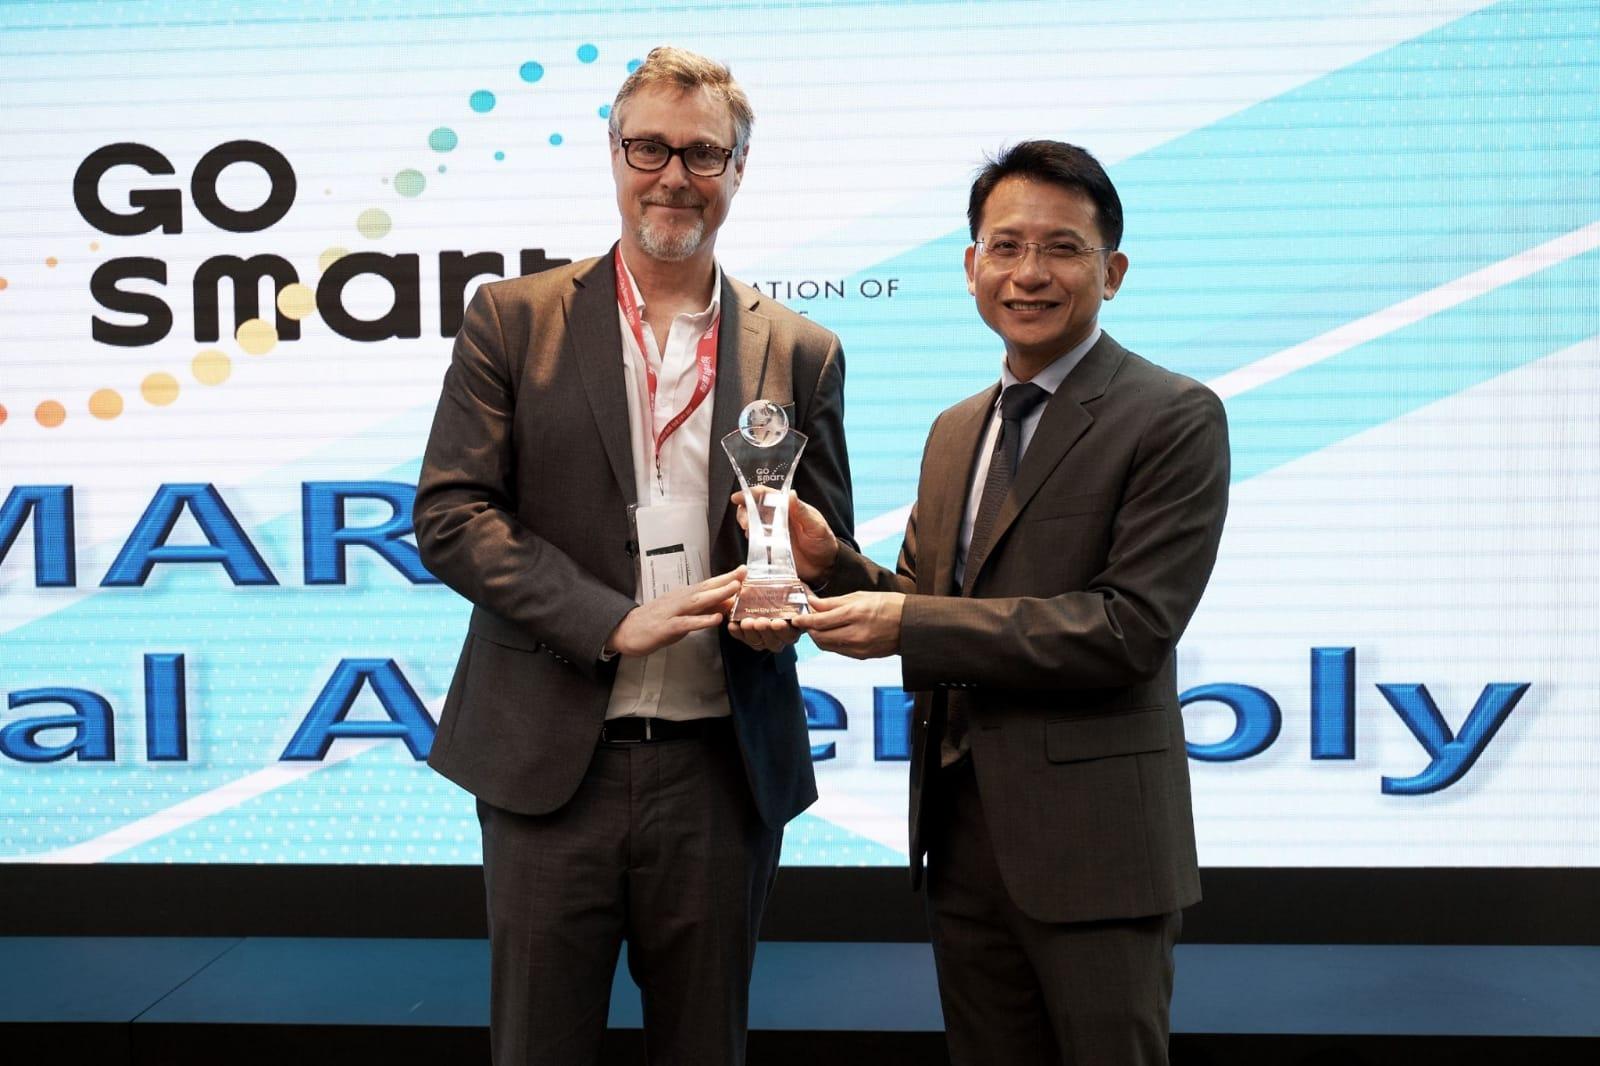 Tapp - Go Smart Taipei Award 2019.jpeg